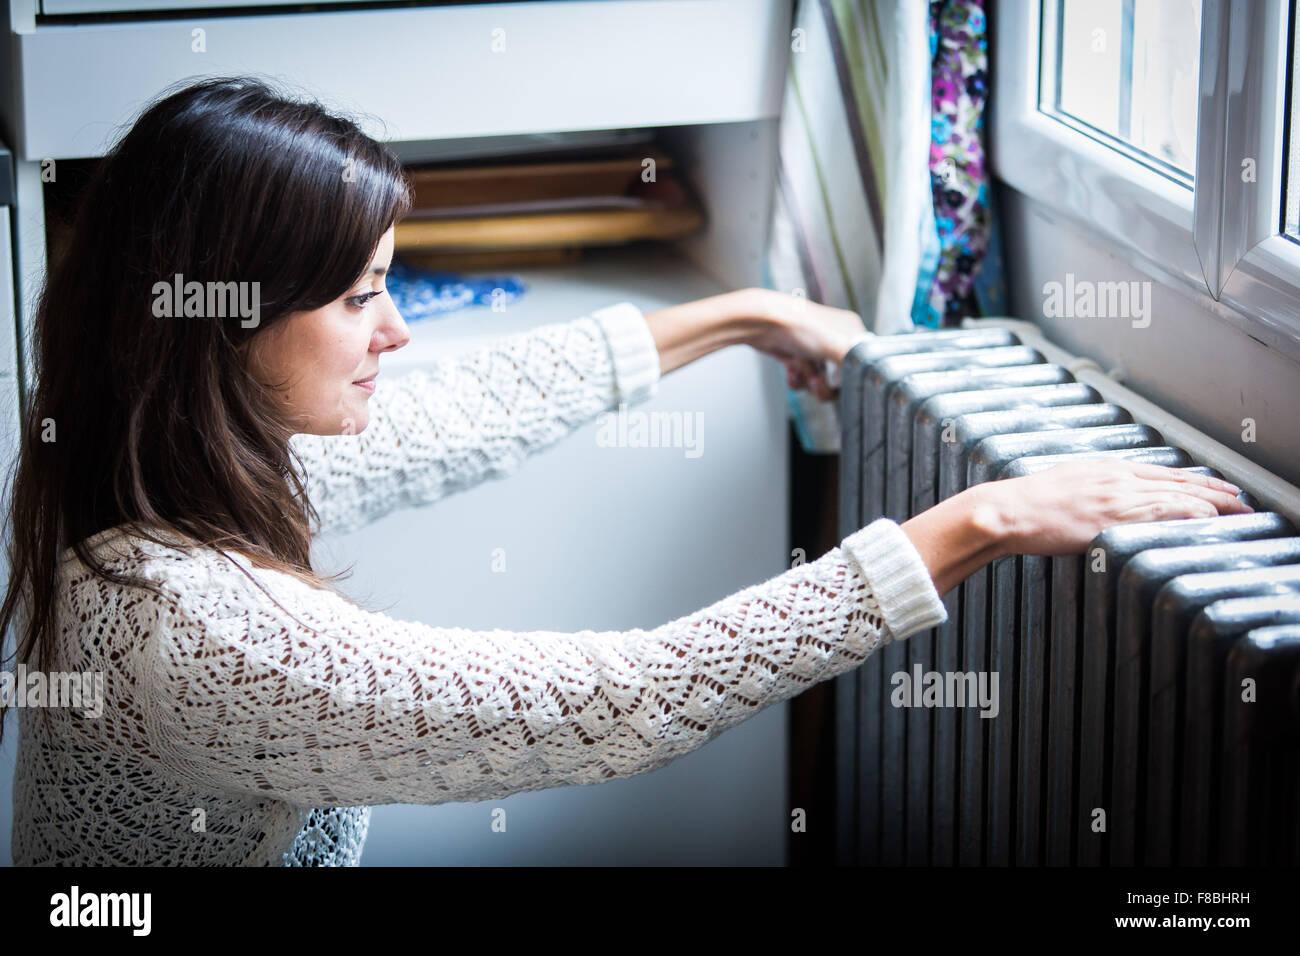 Woman adjusting a thermostatic radiator valve on a domestic radiator. - Stock Image